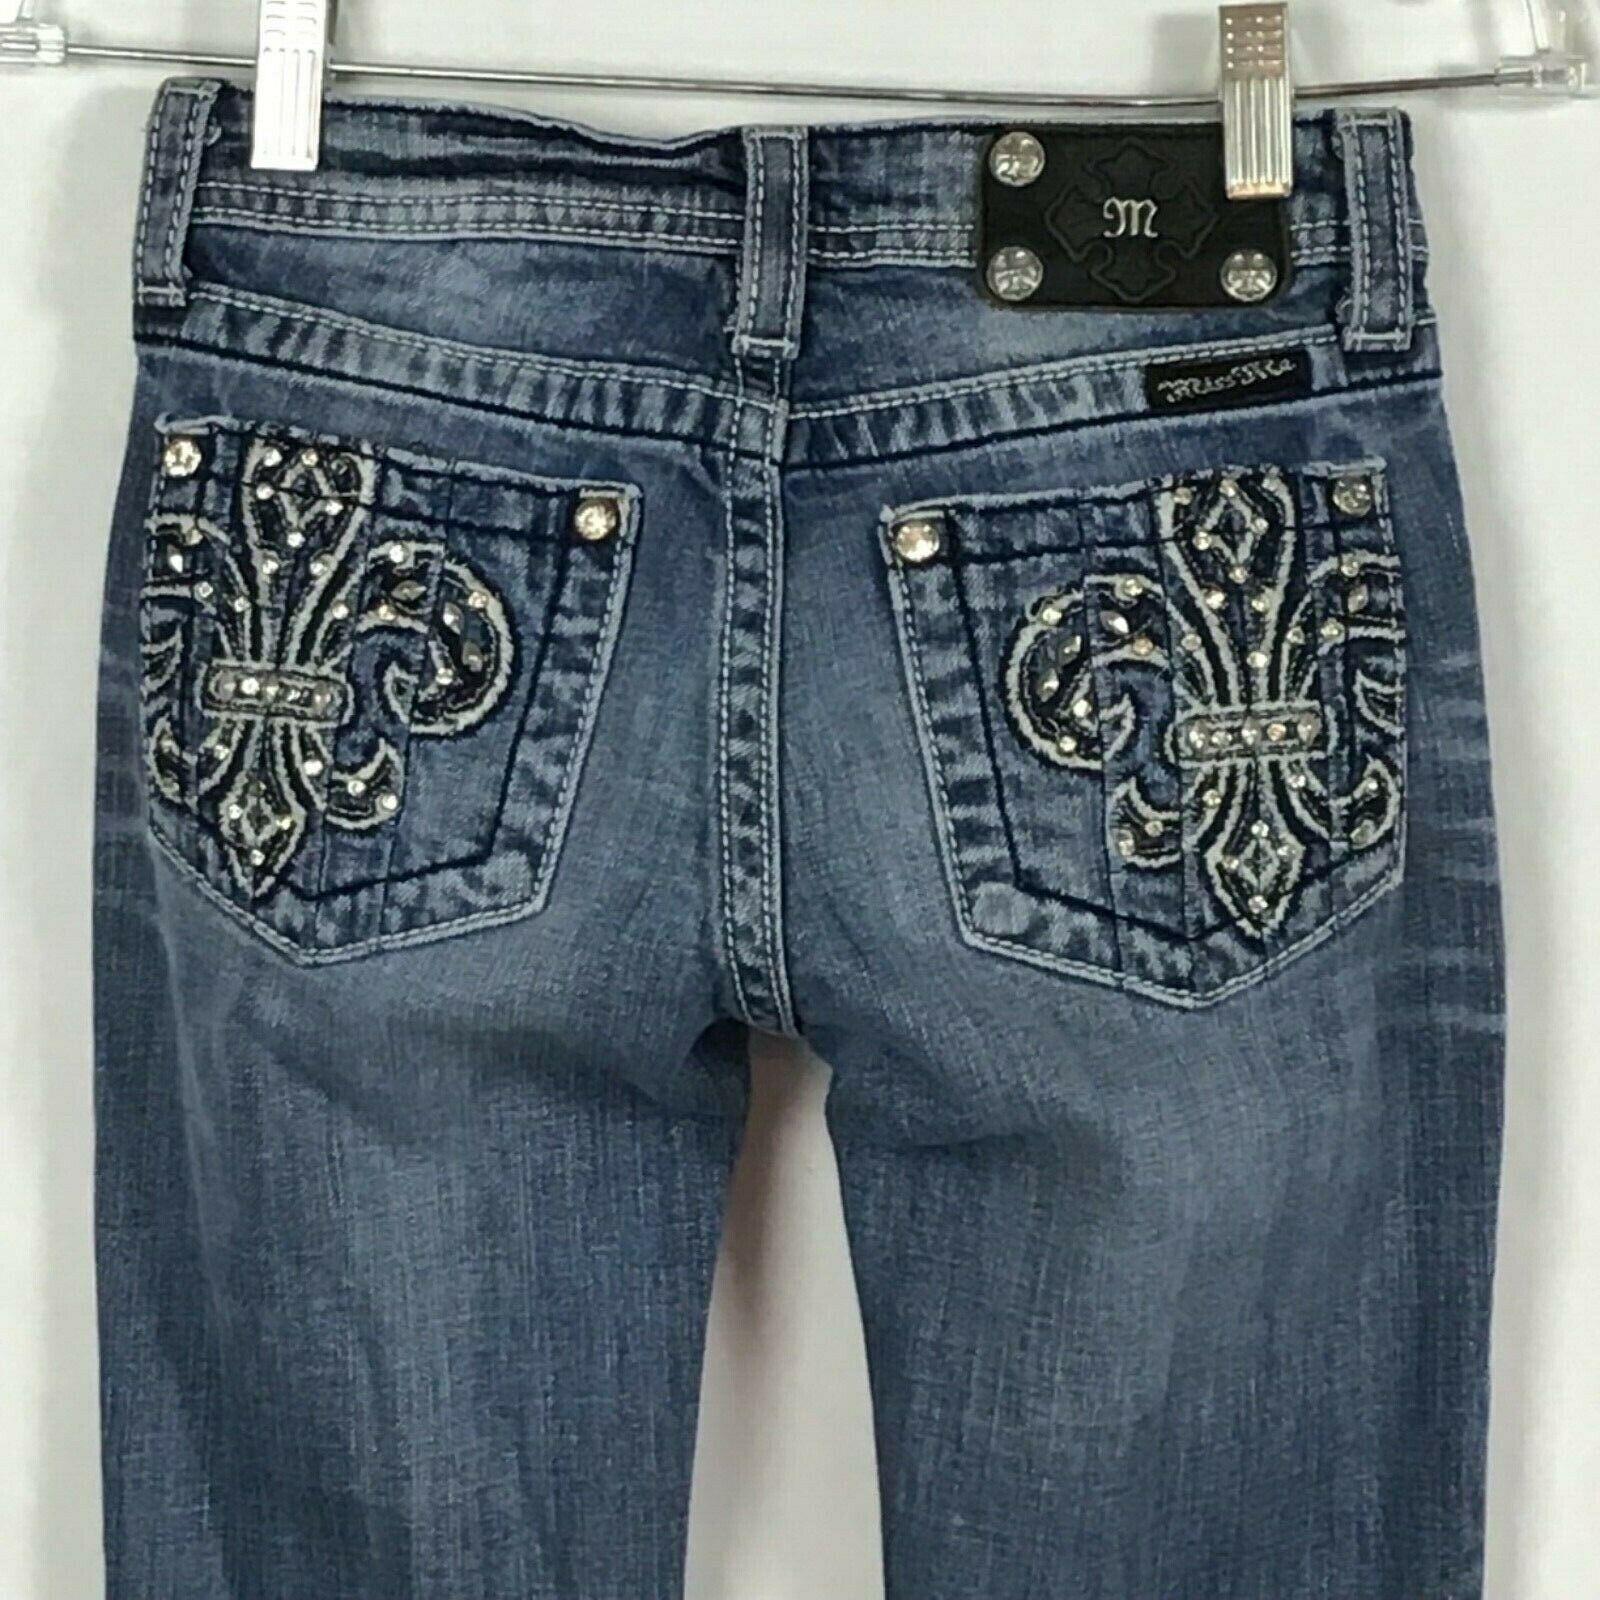 Miss Me Jeans Girls Size 14 Jeans Fleur De Lis BLING Bootcut Distressed B6-9